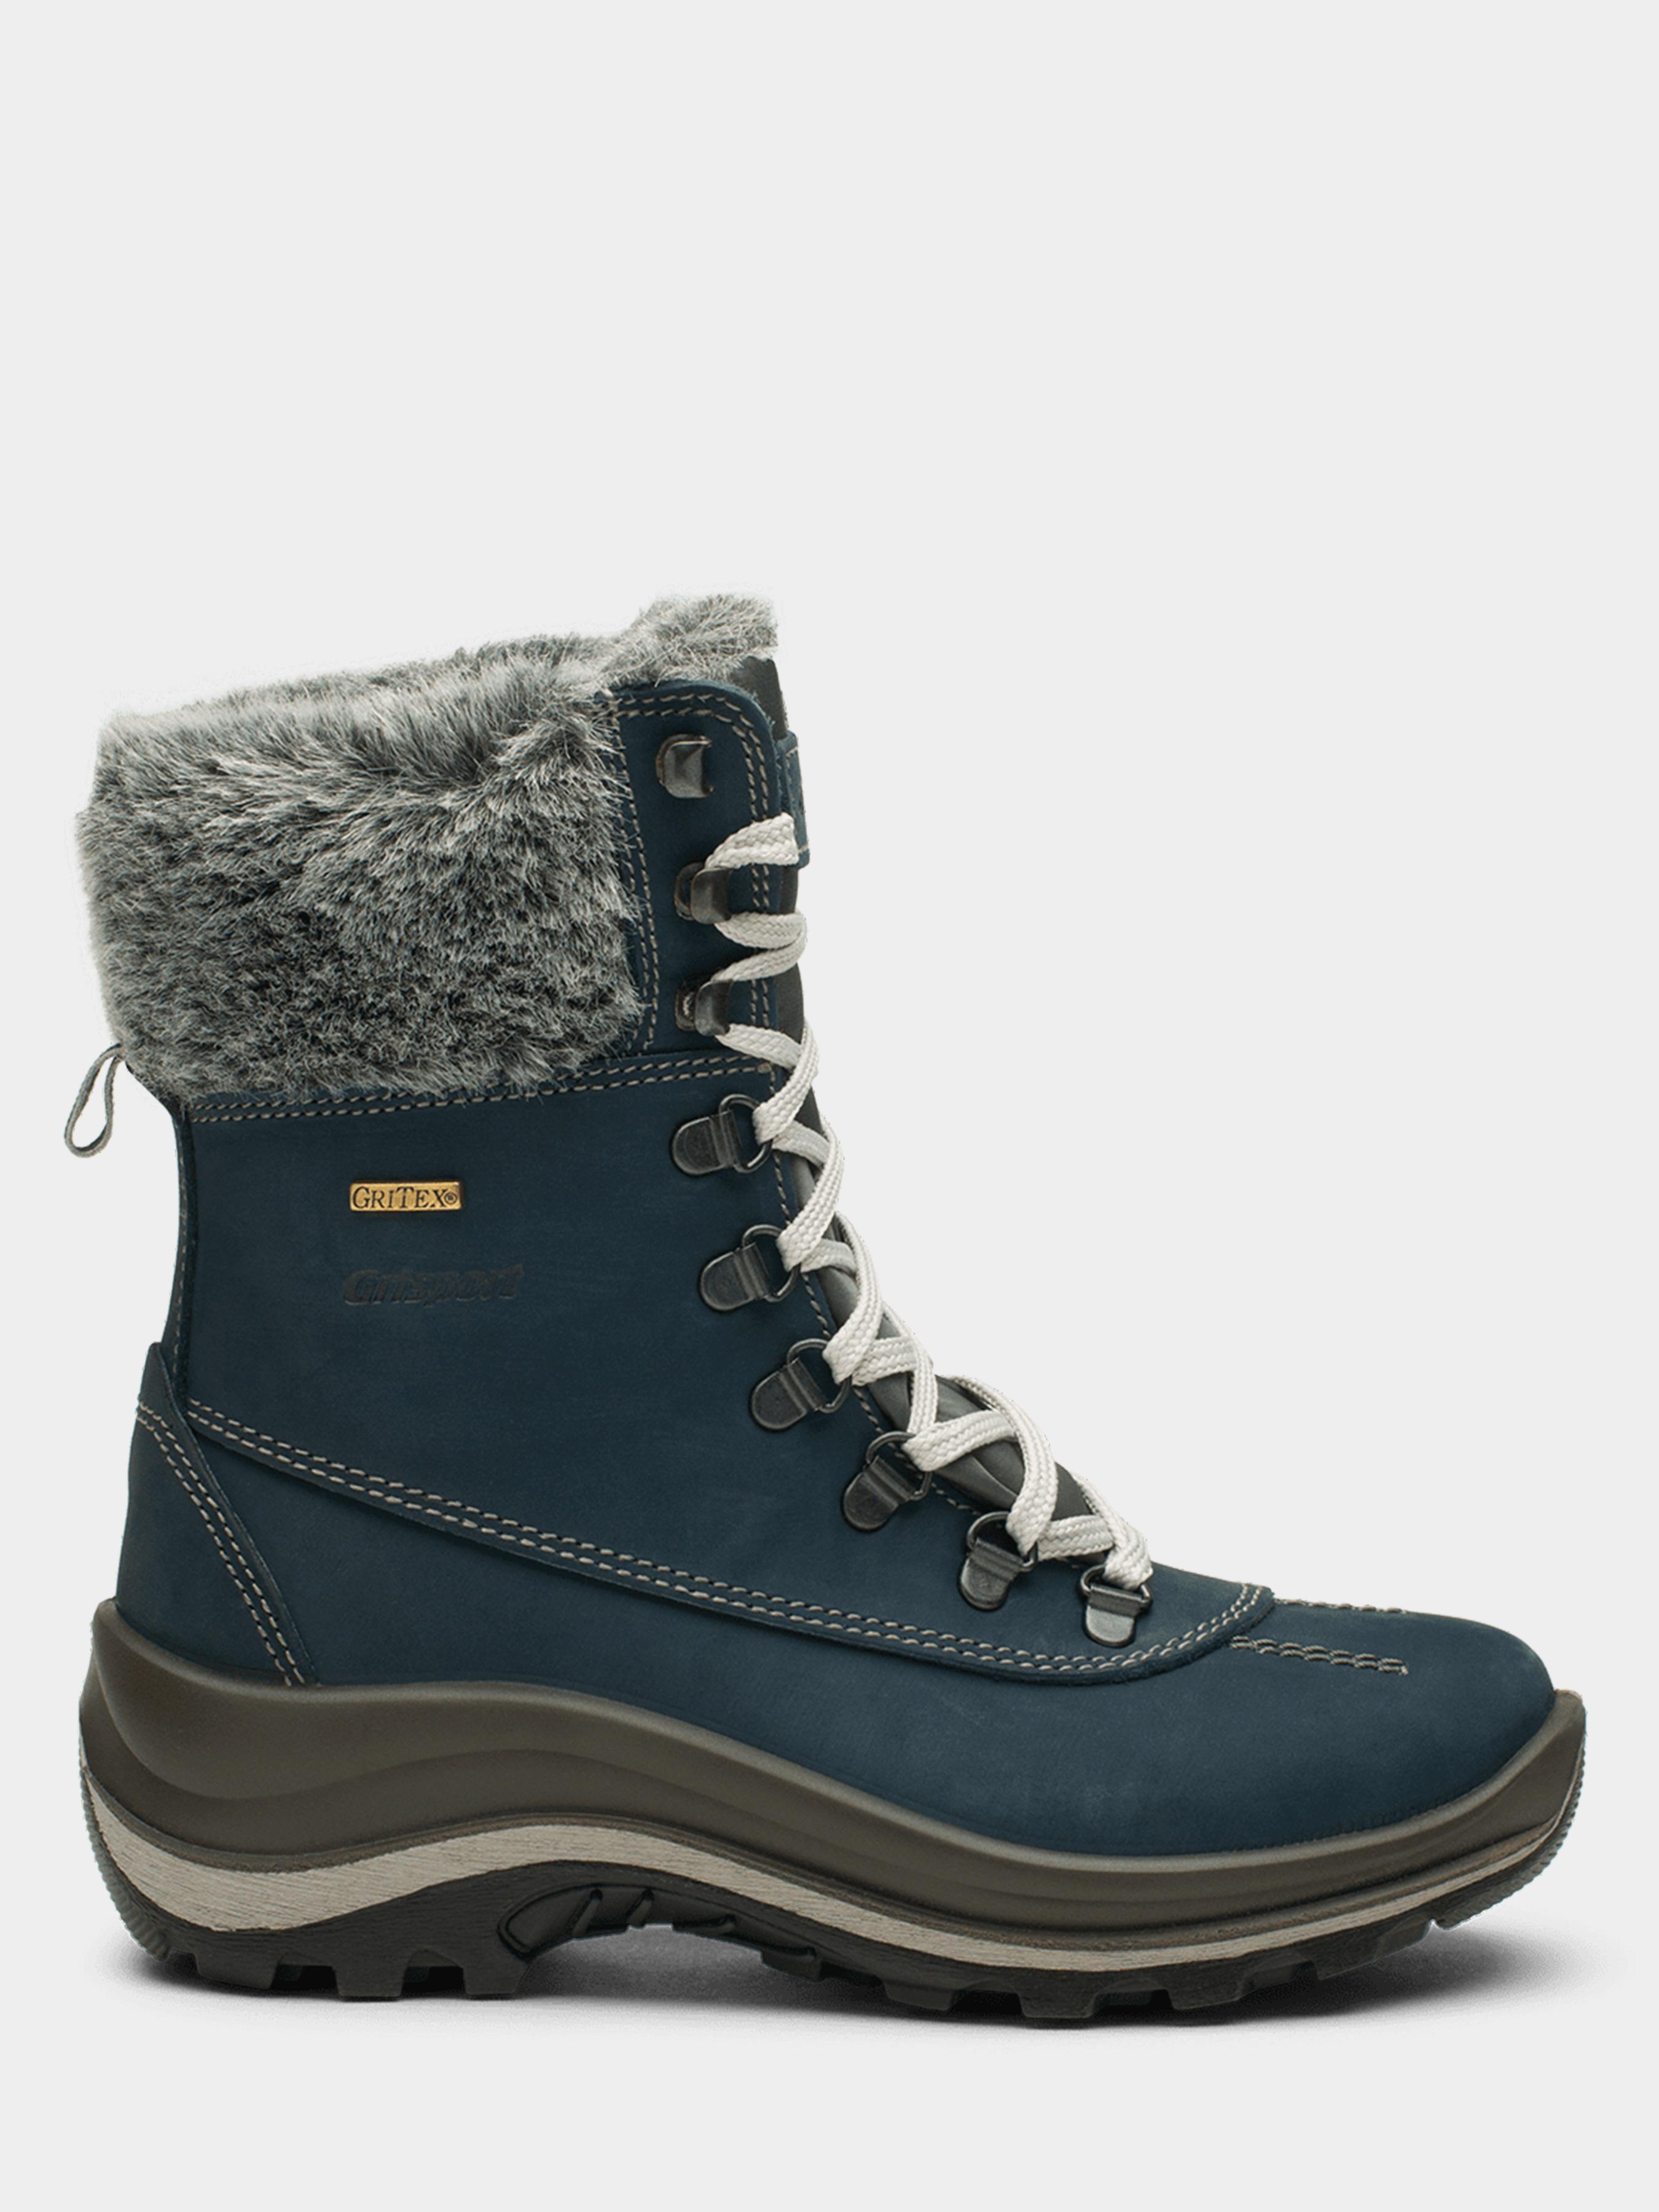 Ботинки женские Grisport 12303-N54